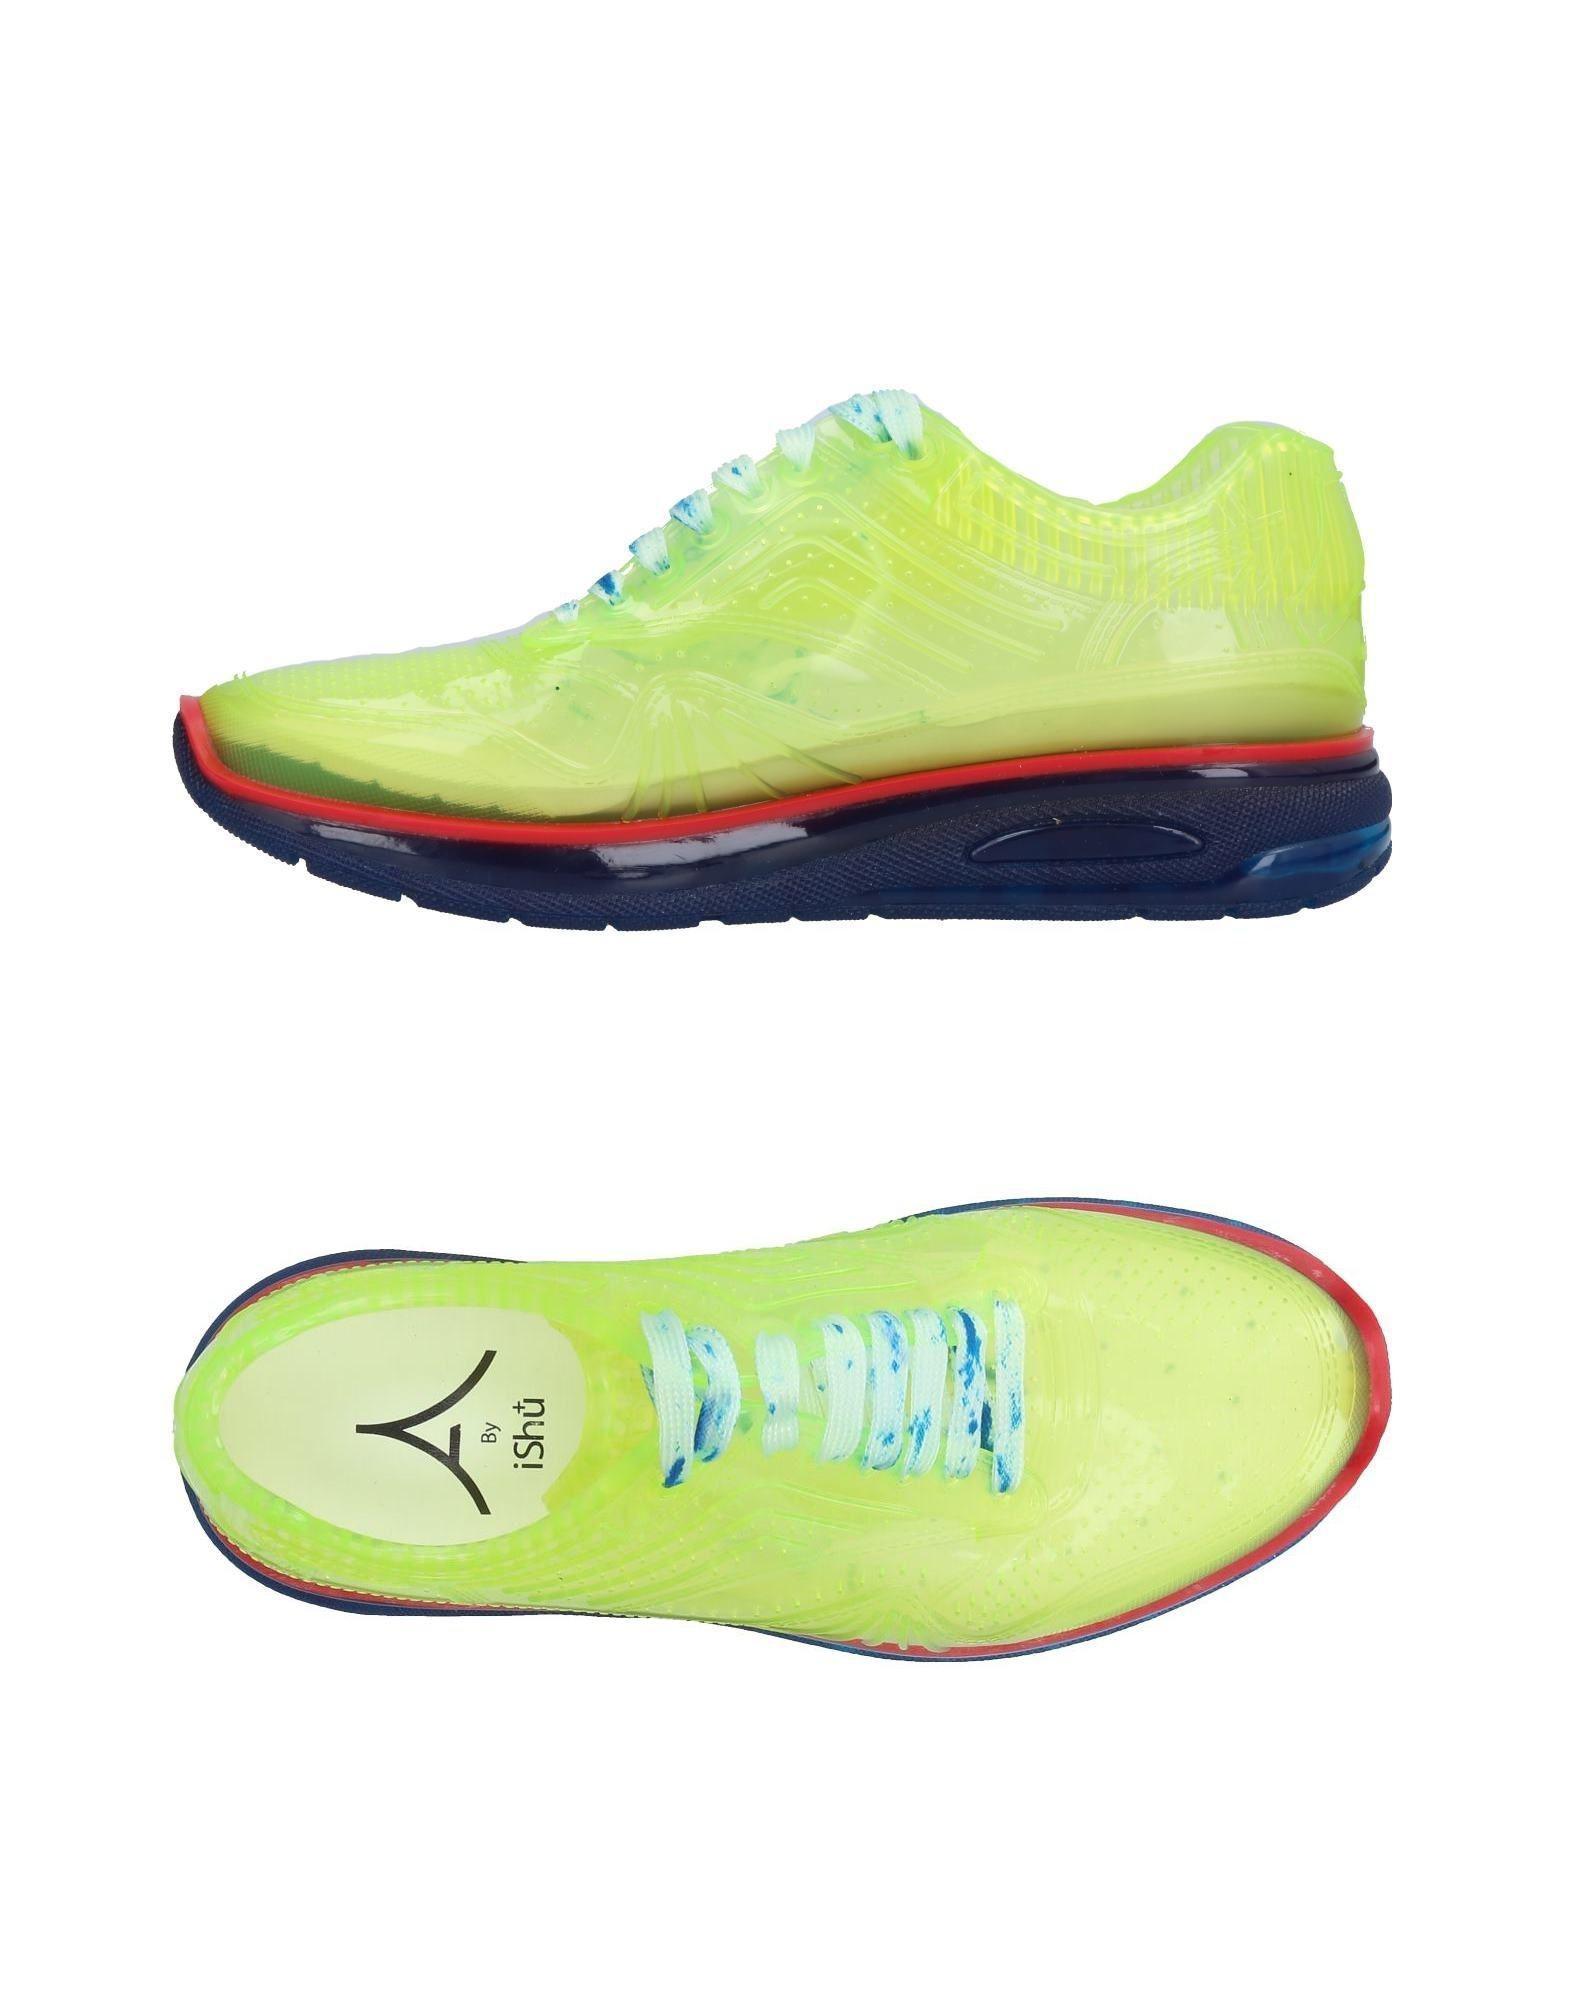 FOOTWEAR - Low-tops & sneakers on YOOX.COM iShu+ 0hji0Kq